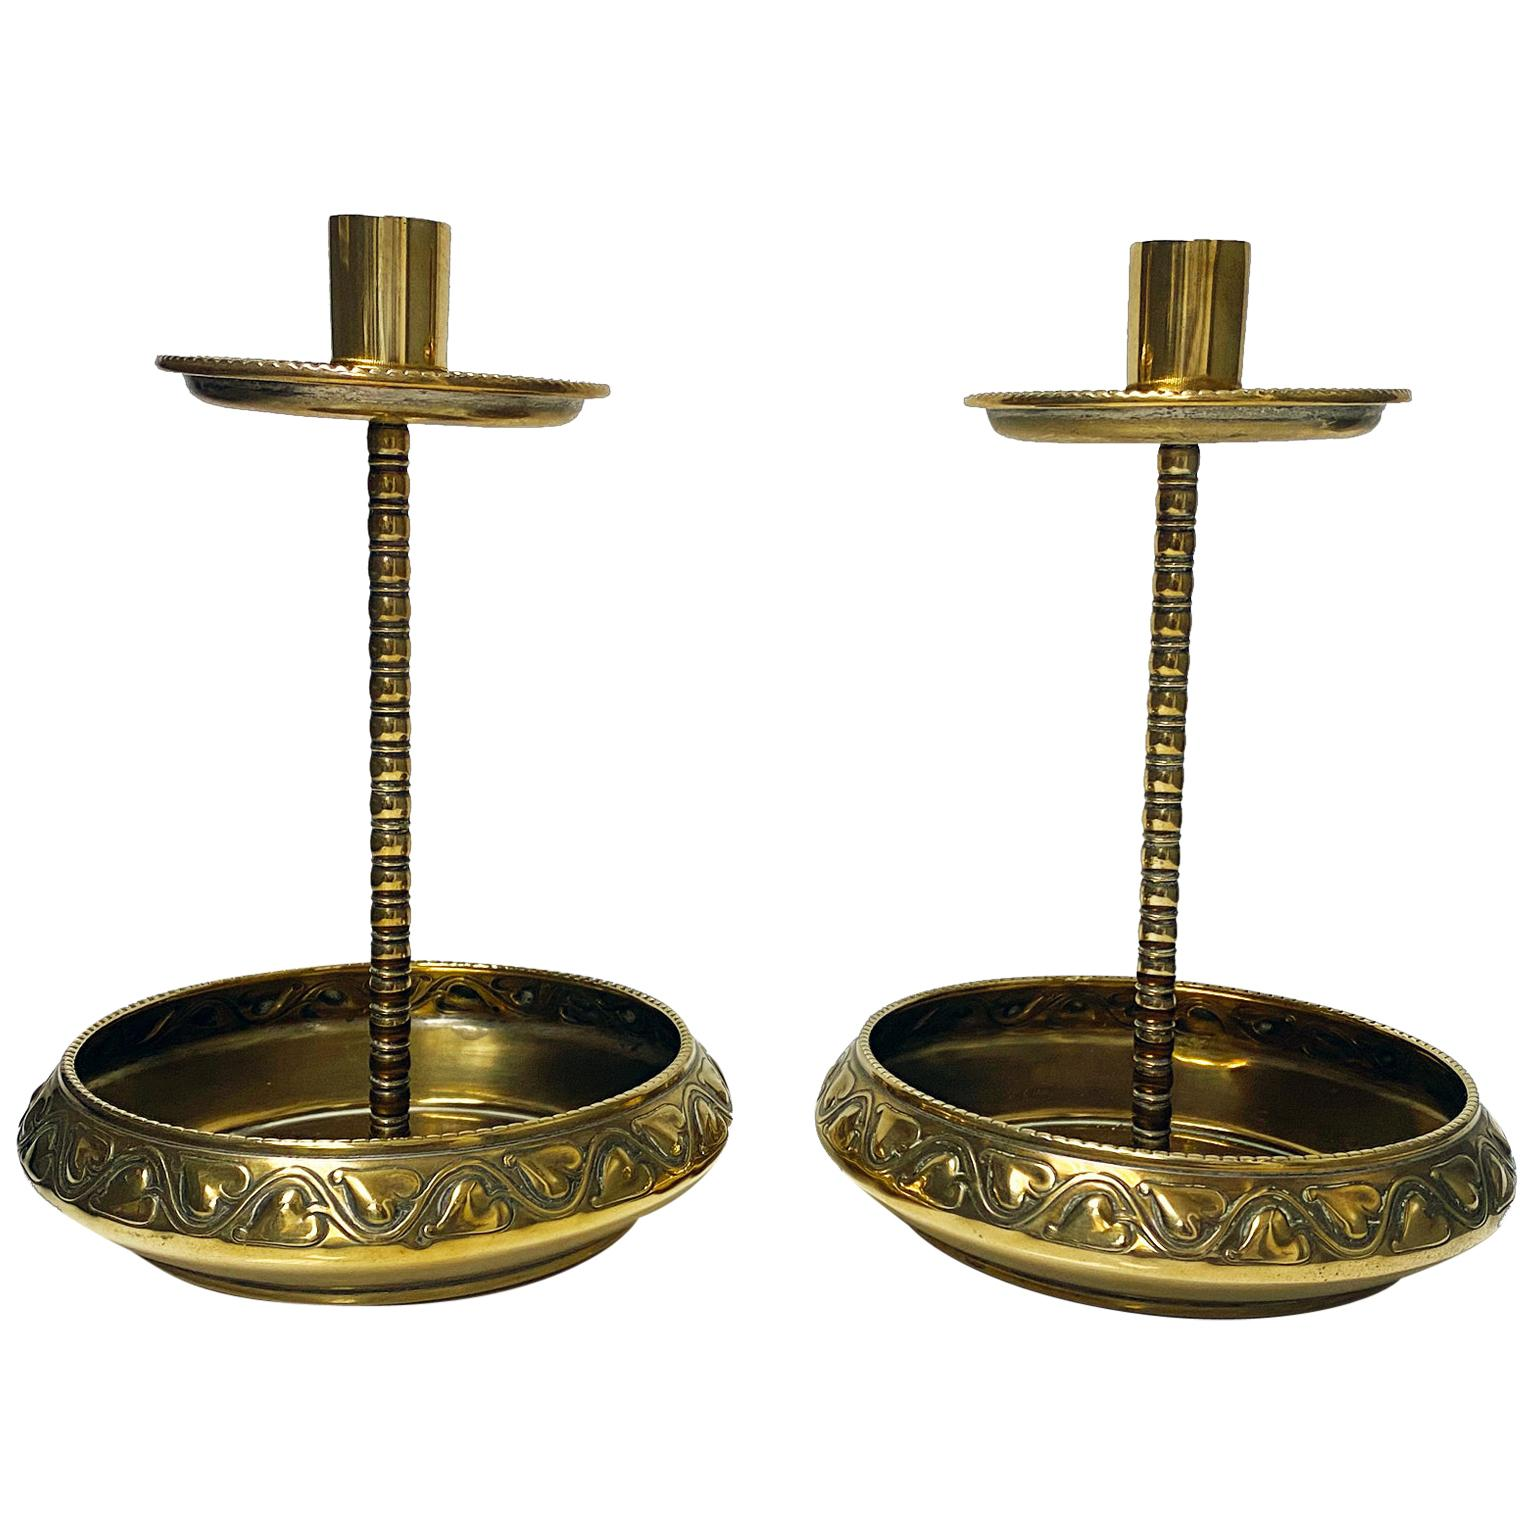 Pair of WMF Brass Arts Crafts Candlesticks, C.1900